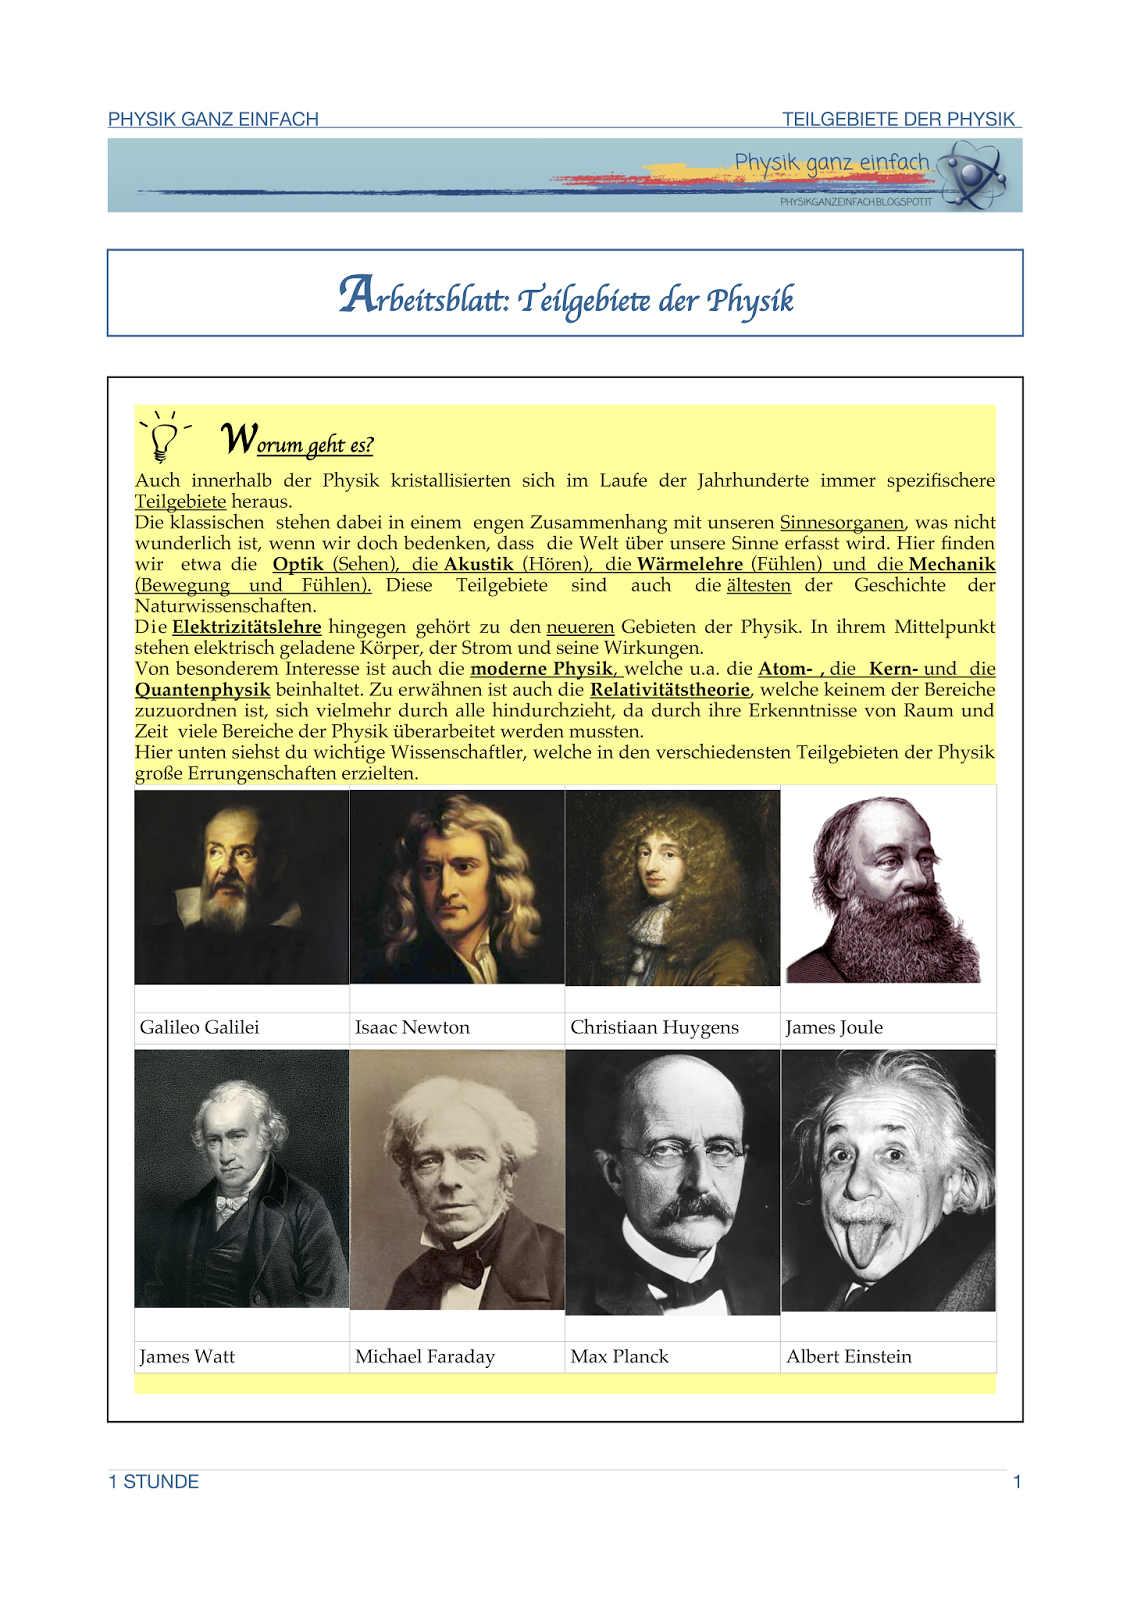 Programm 2. Klasse | Physik ganz einfach